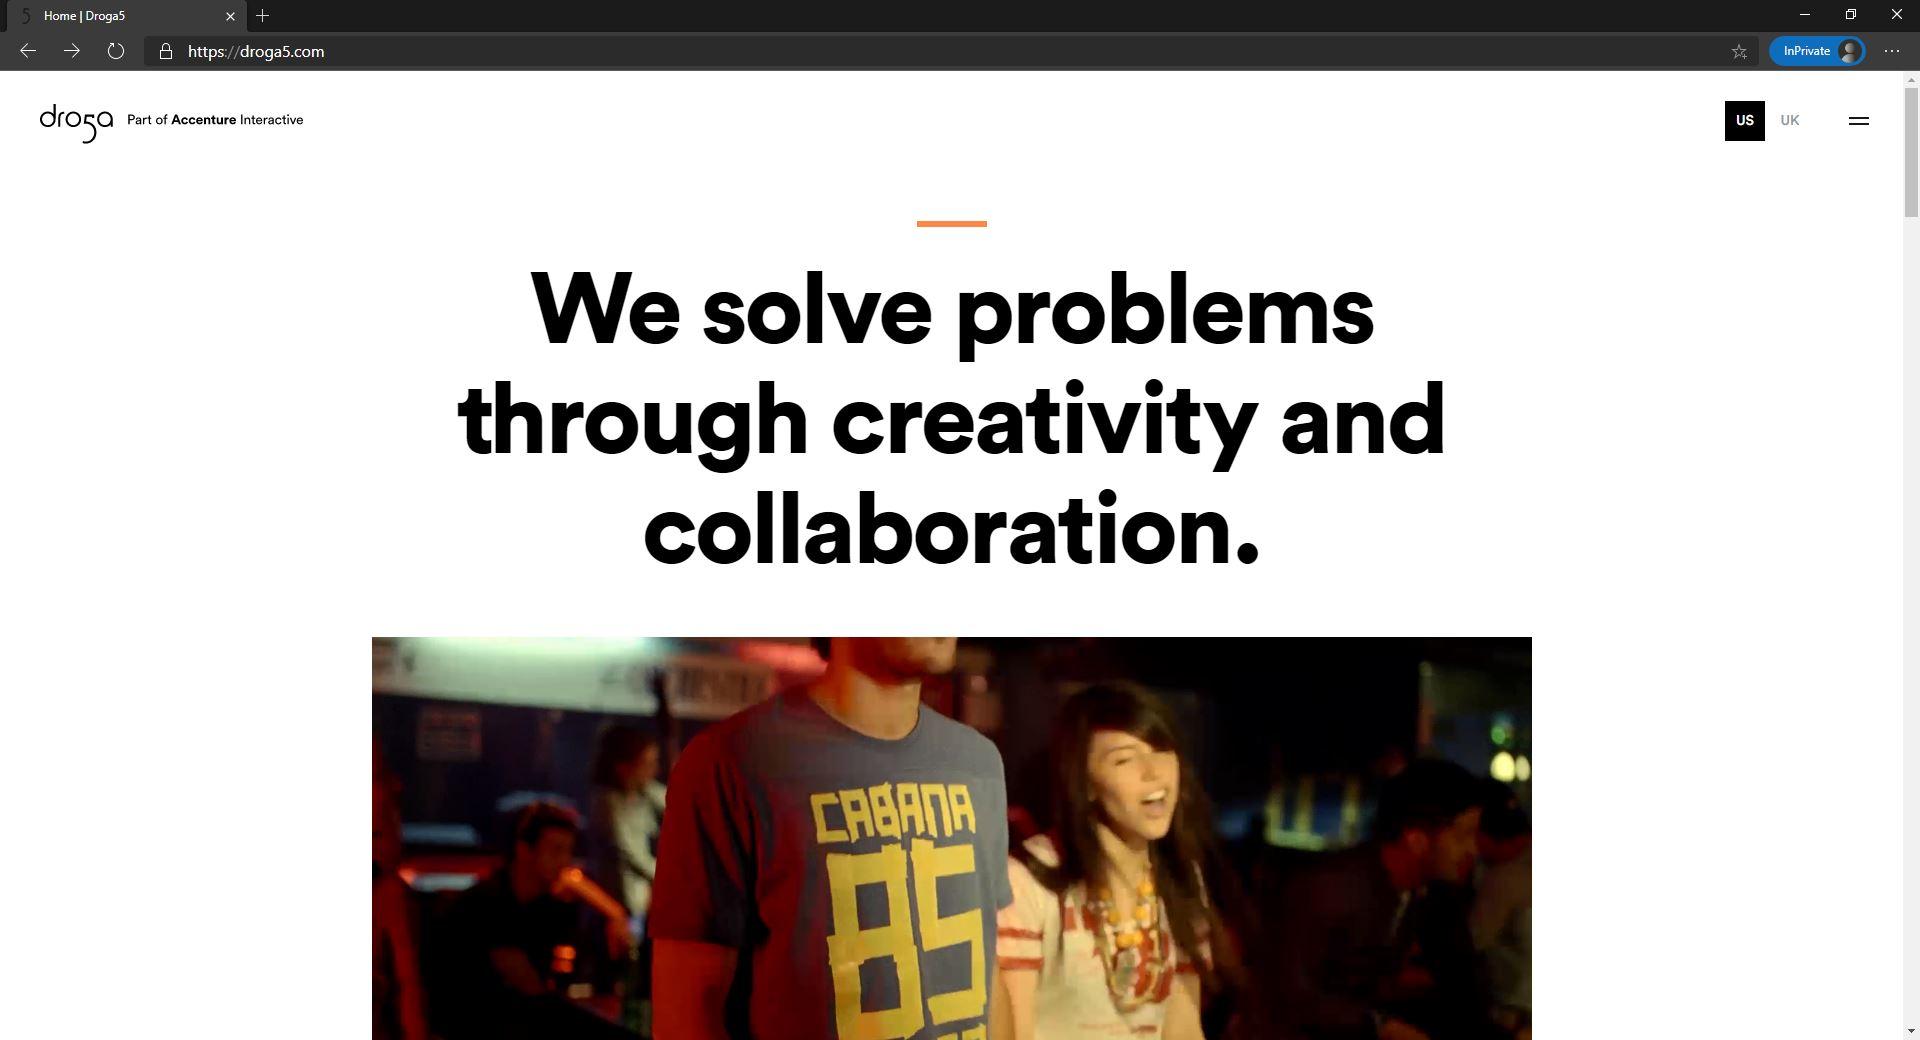 Droga5 website